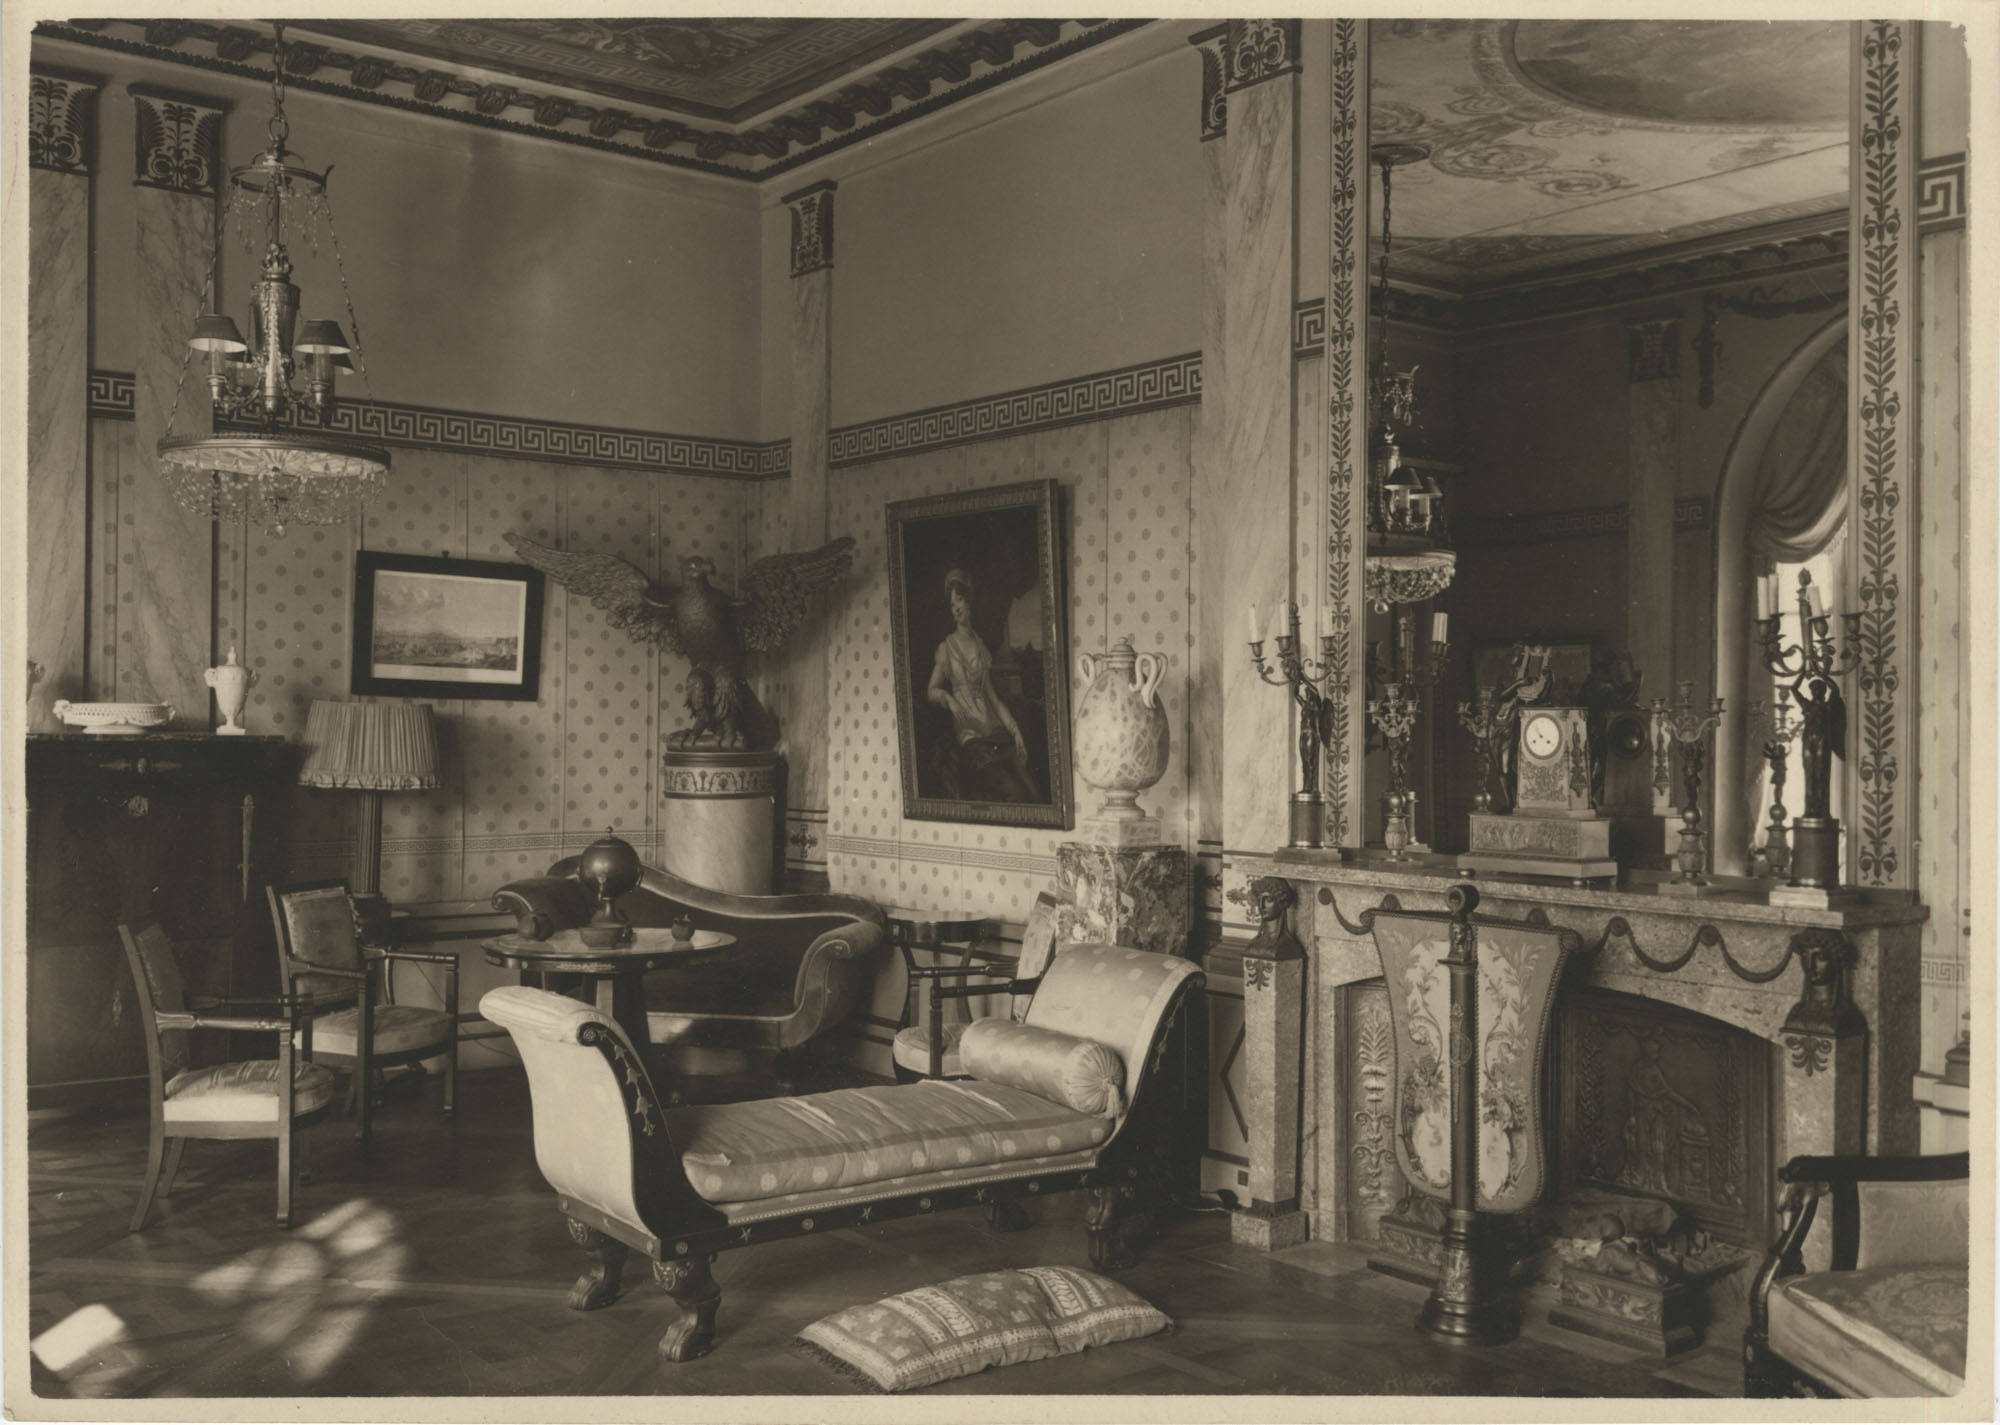 Interior of the Royal Italian Consul in Sri Lanka, Photograph 33